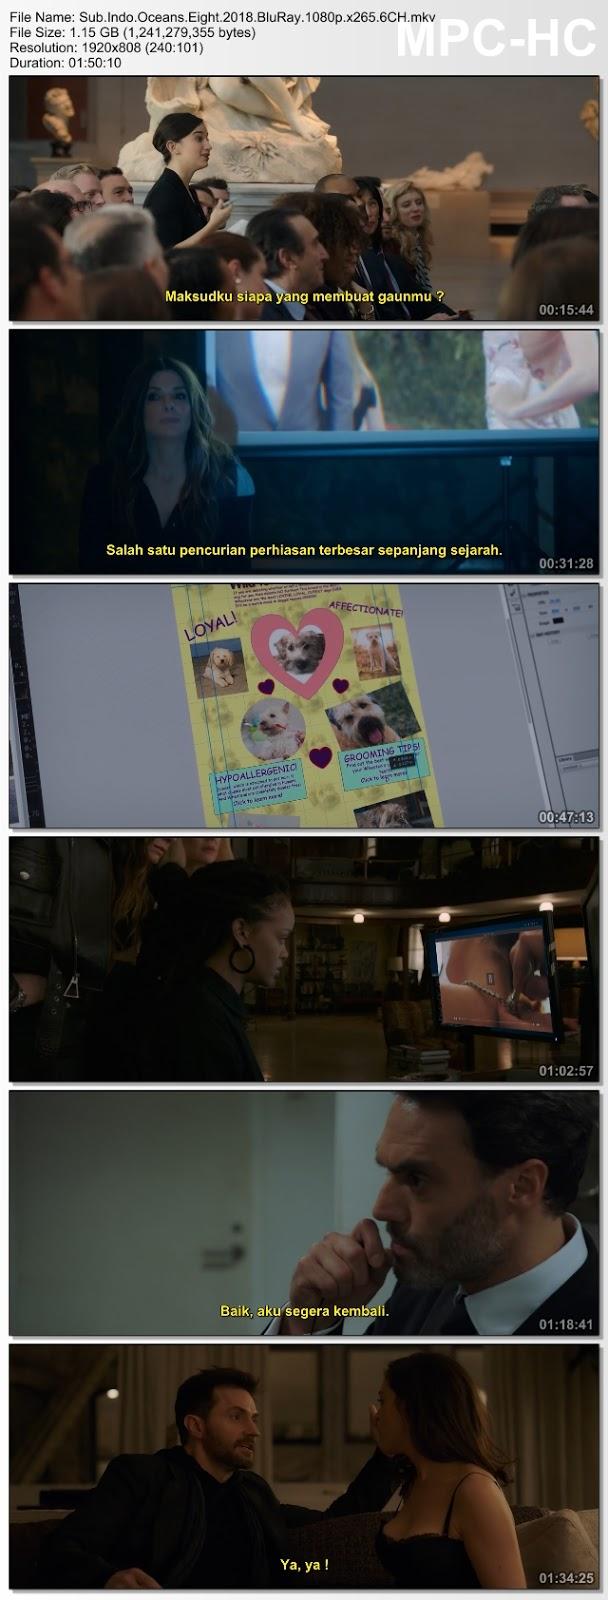 Screenshots Download Oito Mulheres e um Segredo (2018) BluRay 480p & 3GP Subtitle Indonesia